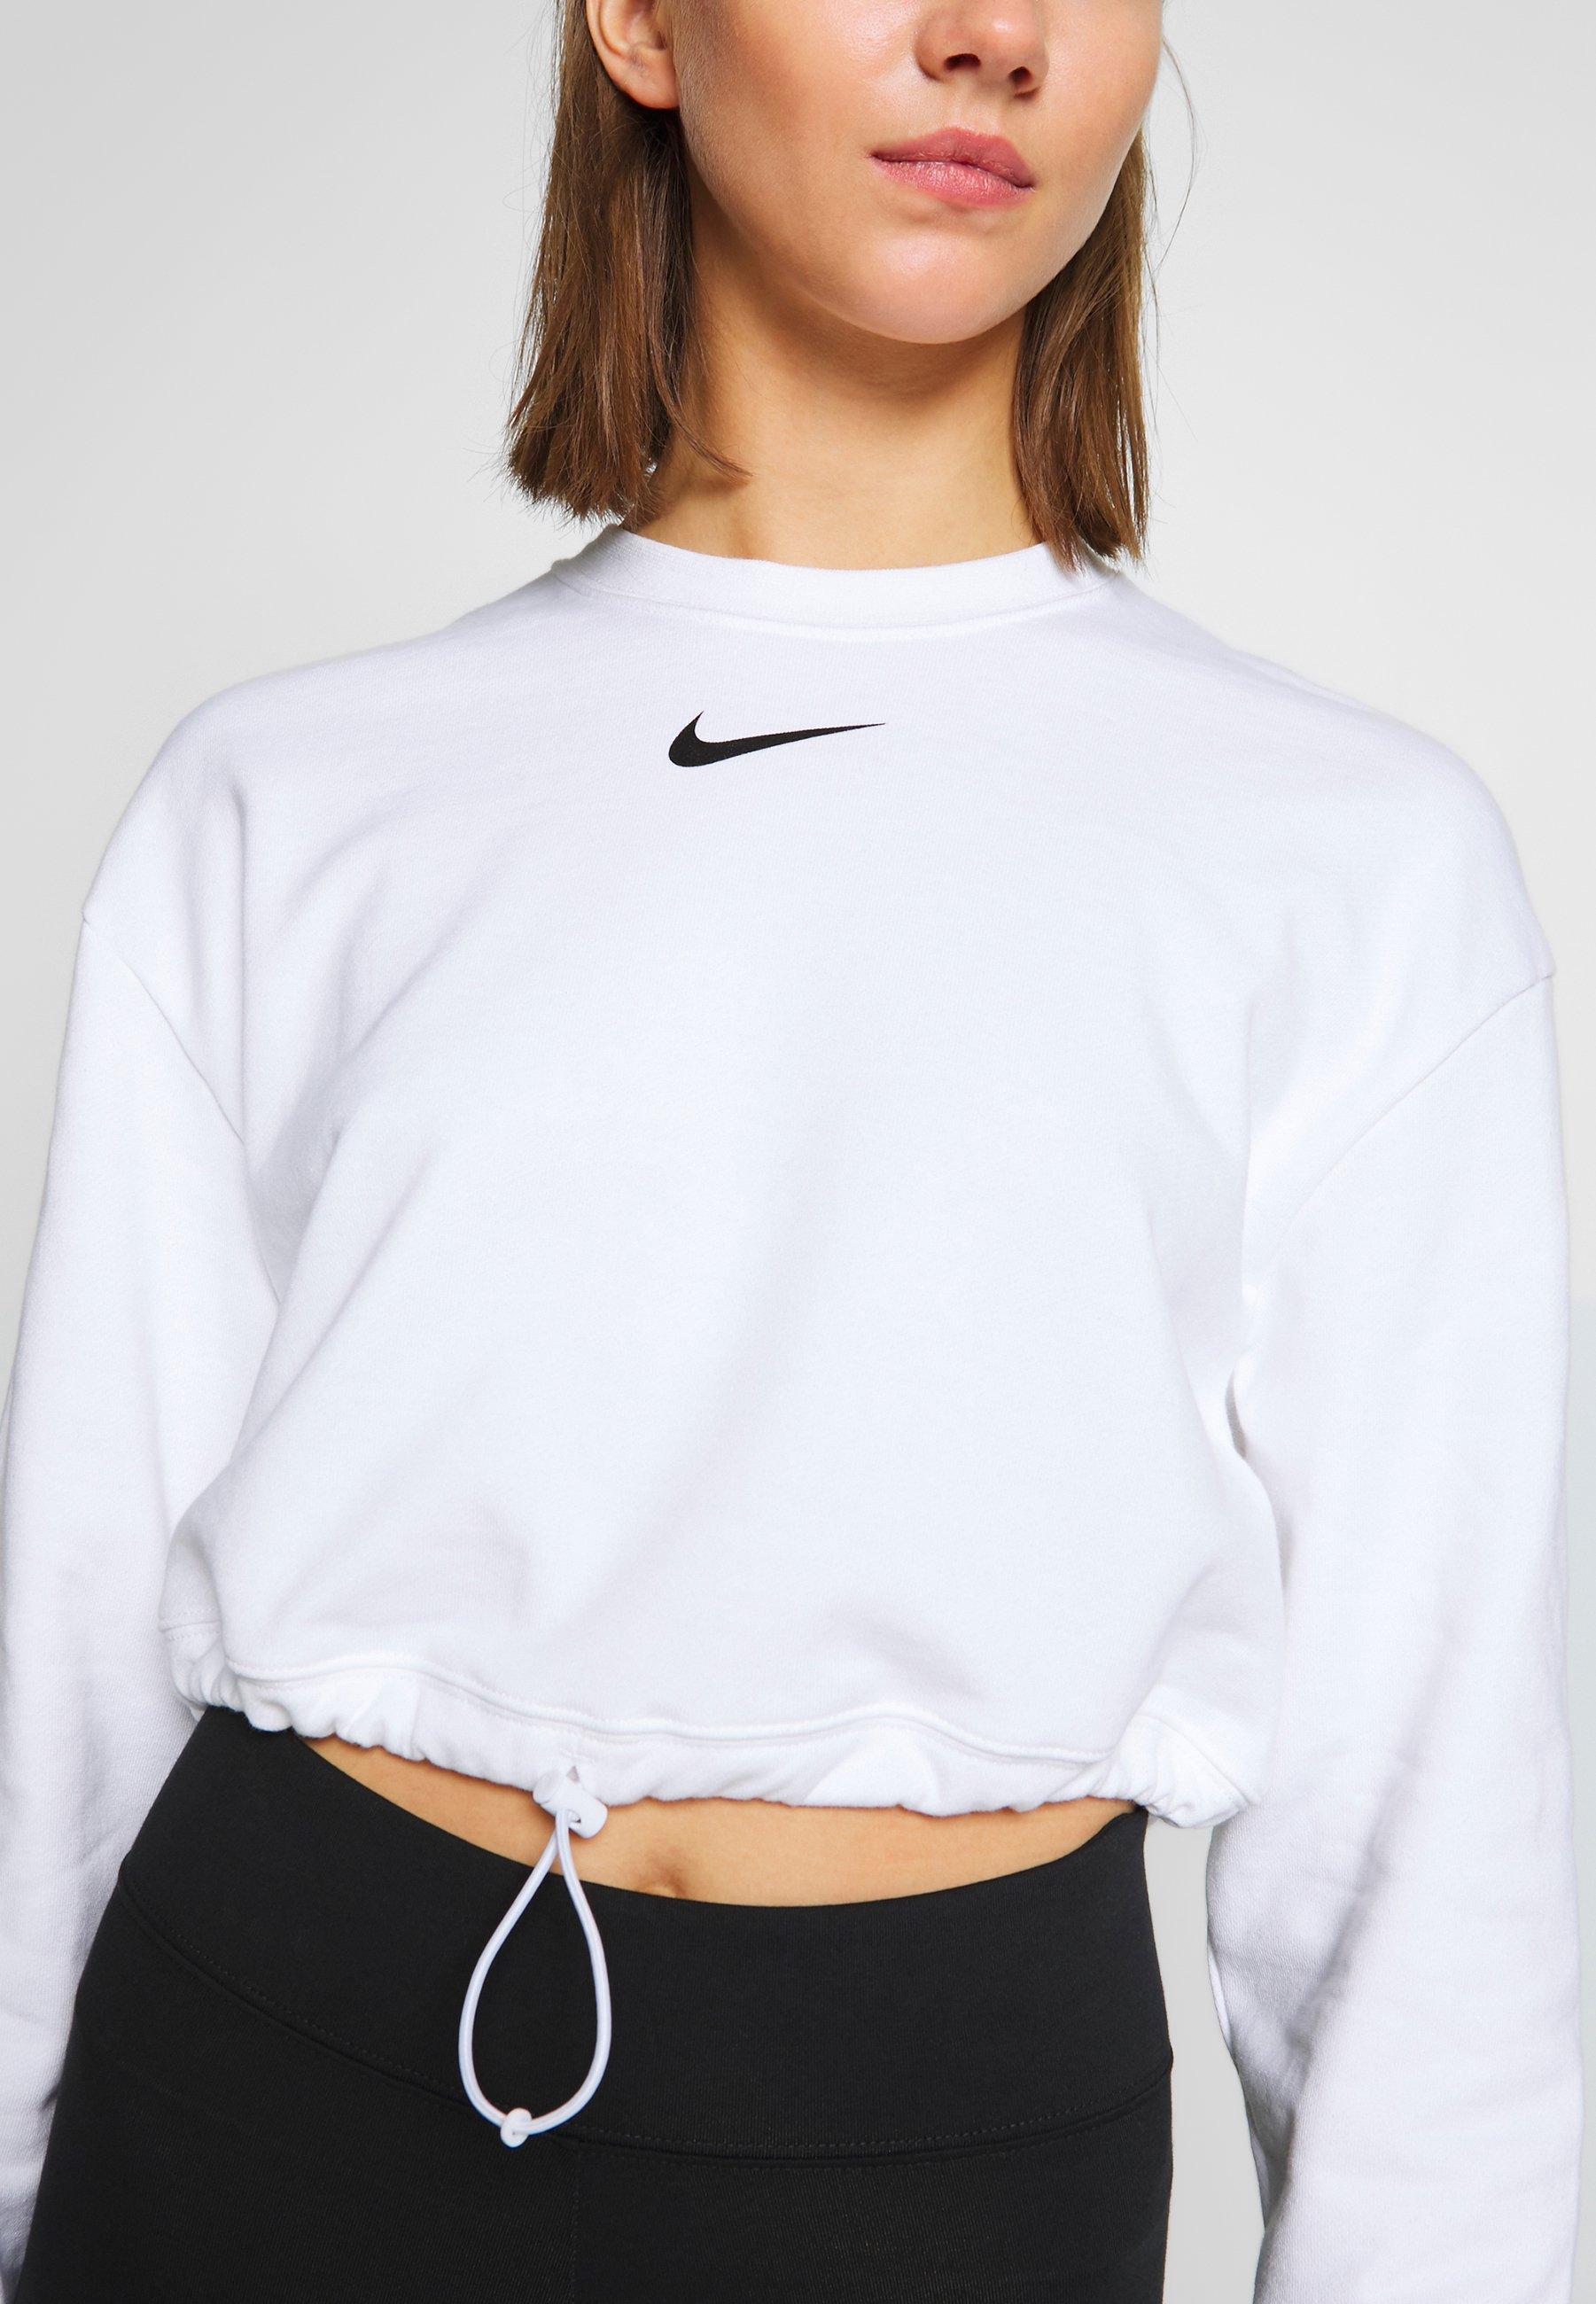 Nike Sportswear Sweatshirt whiteblack Zalando.at